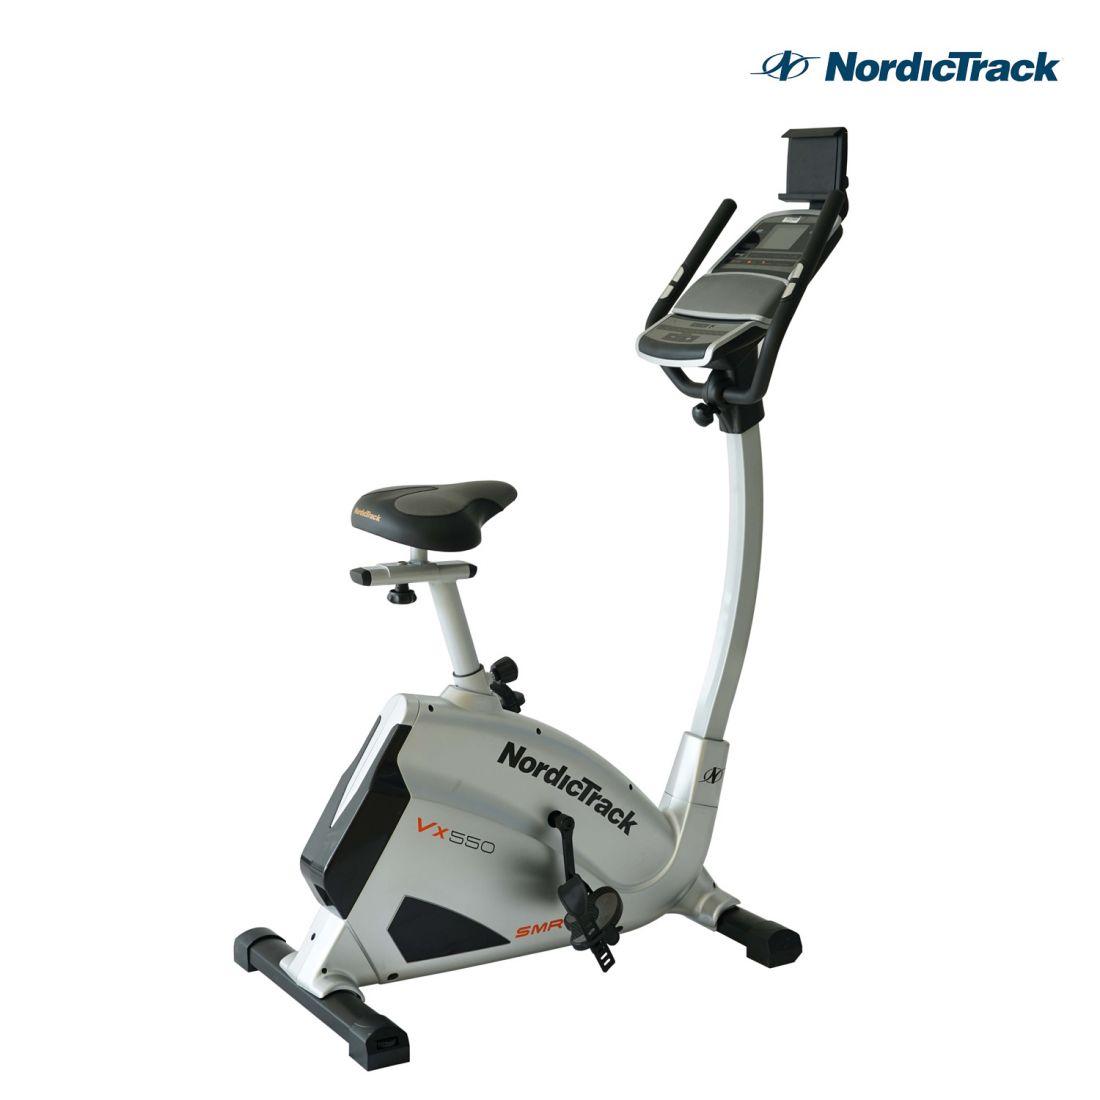 NordicTrack VX550